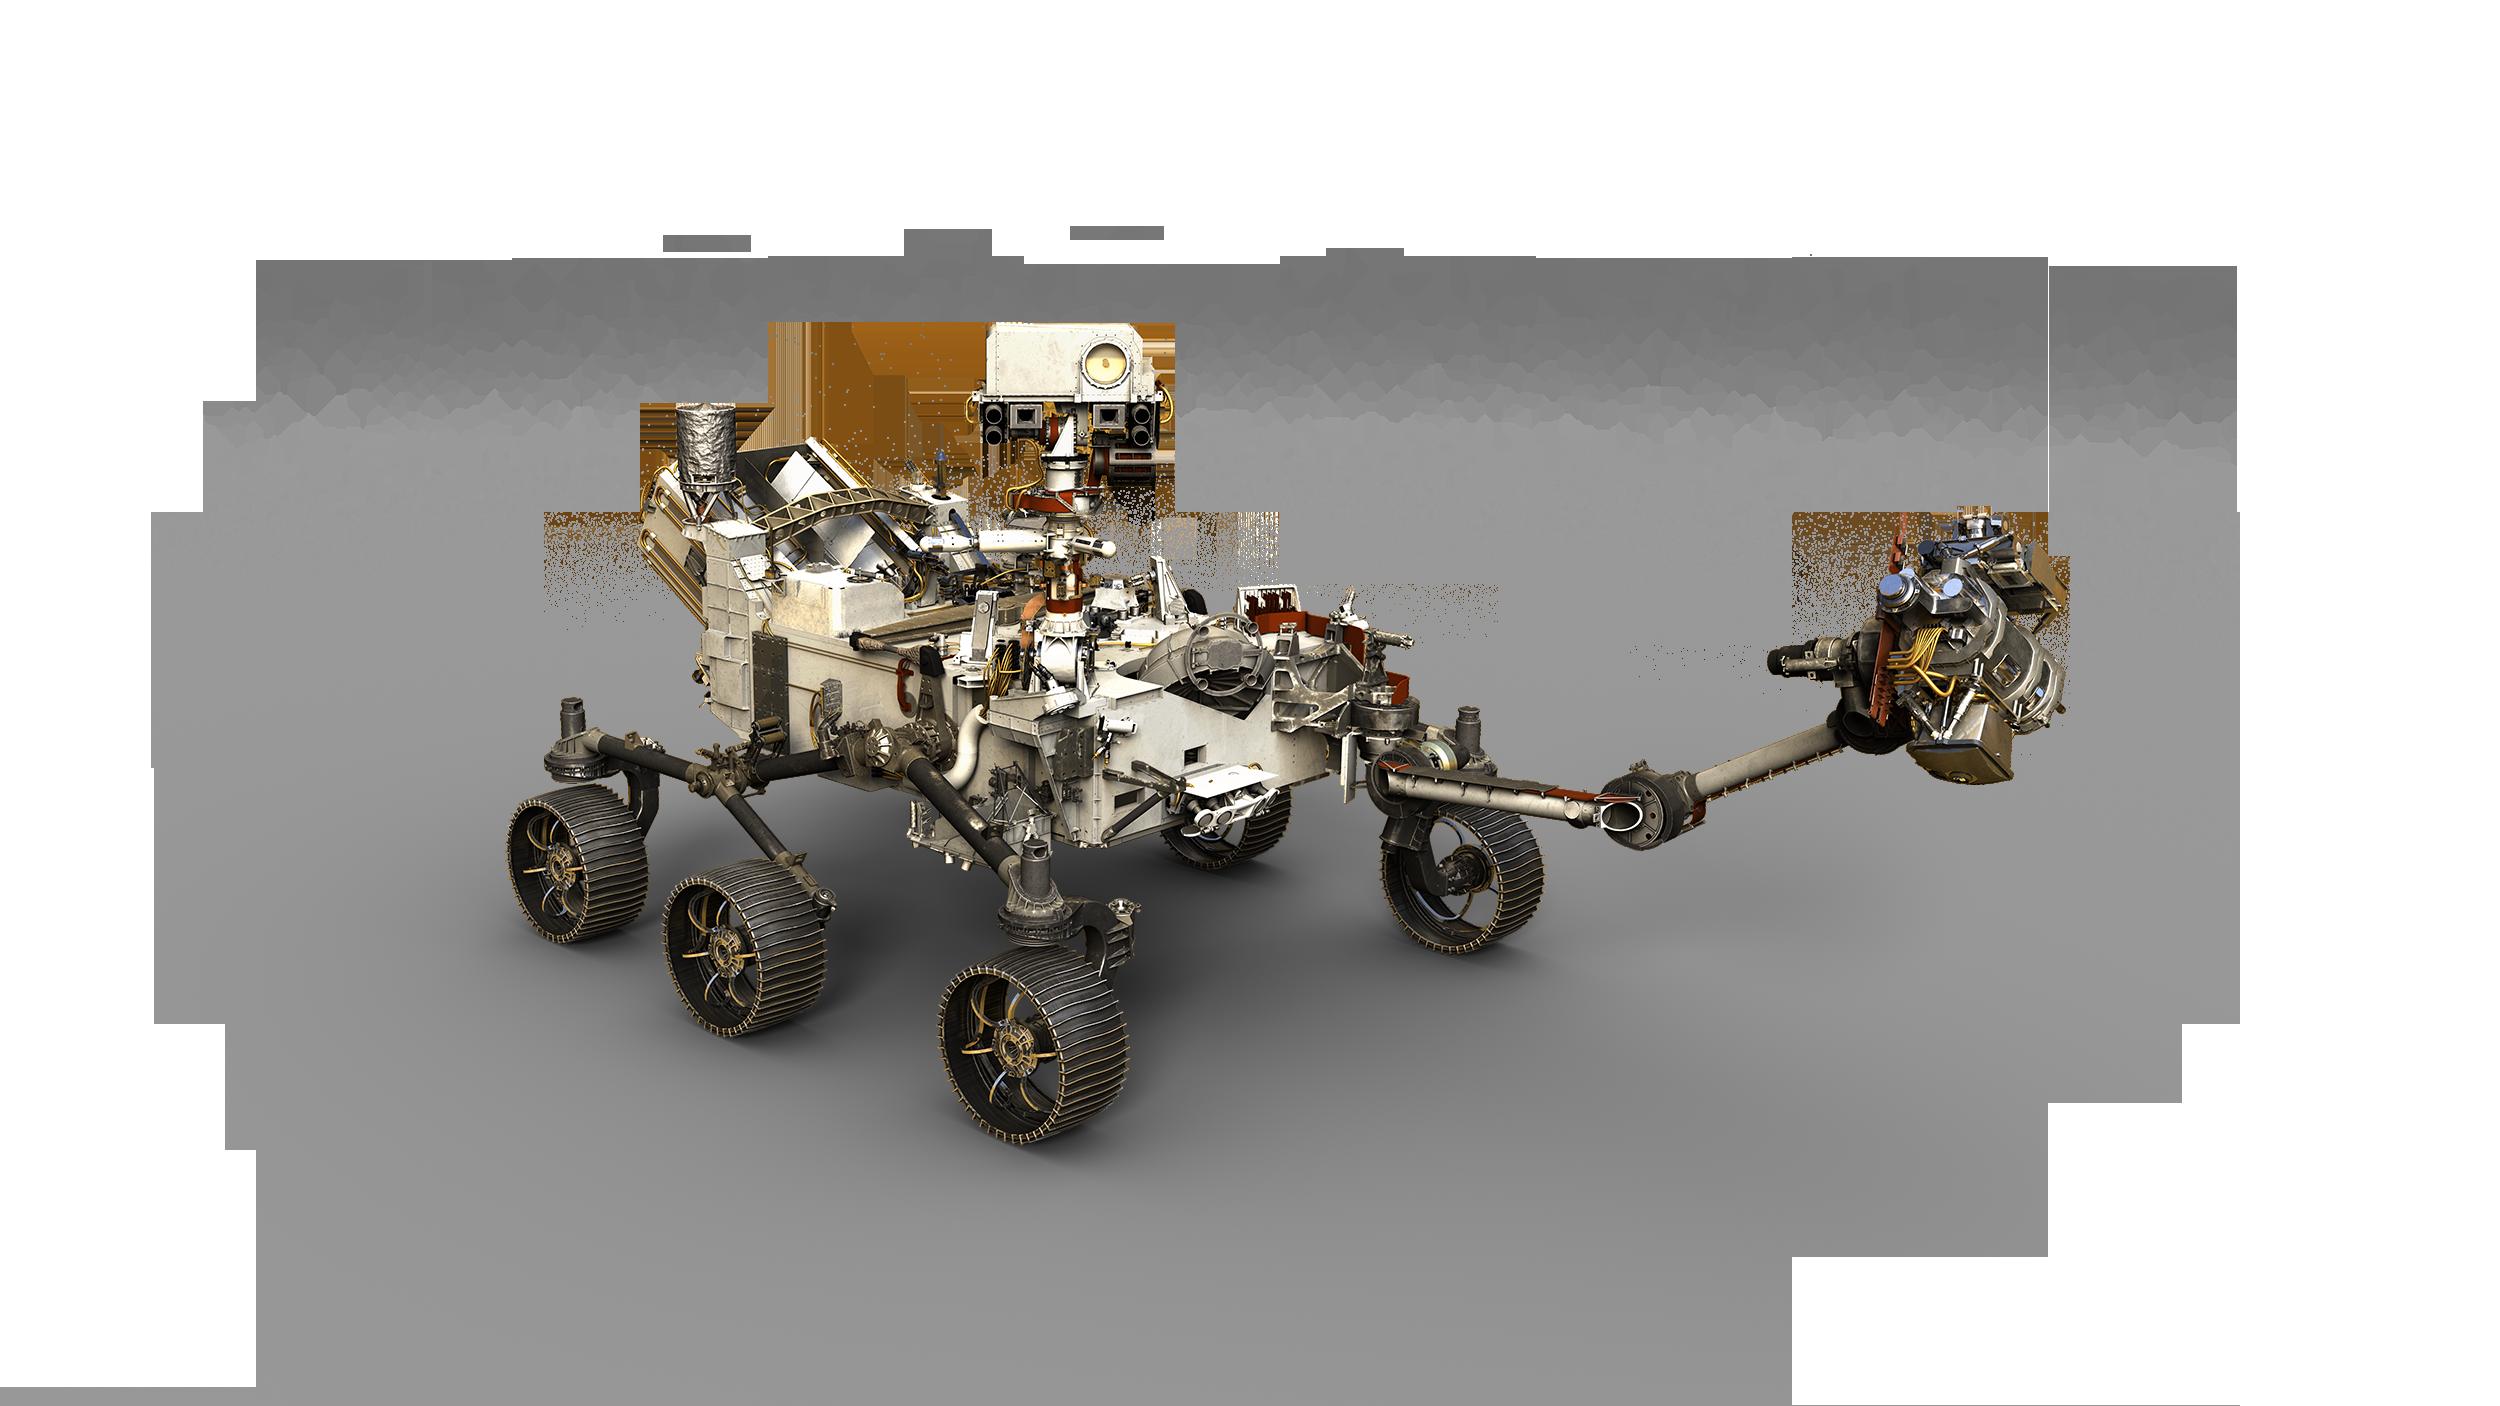 space rover png transparent space rover png images pluspng car 3d diagram 36 volt club car wiring diagram